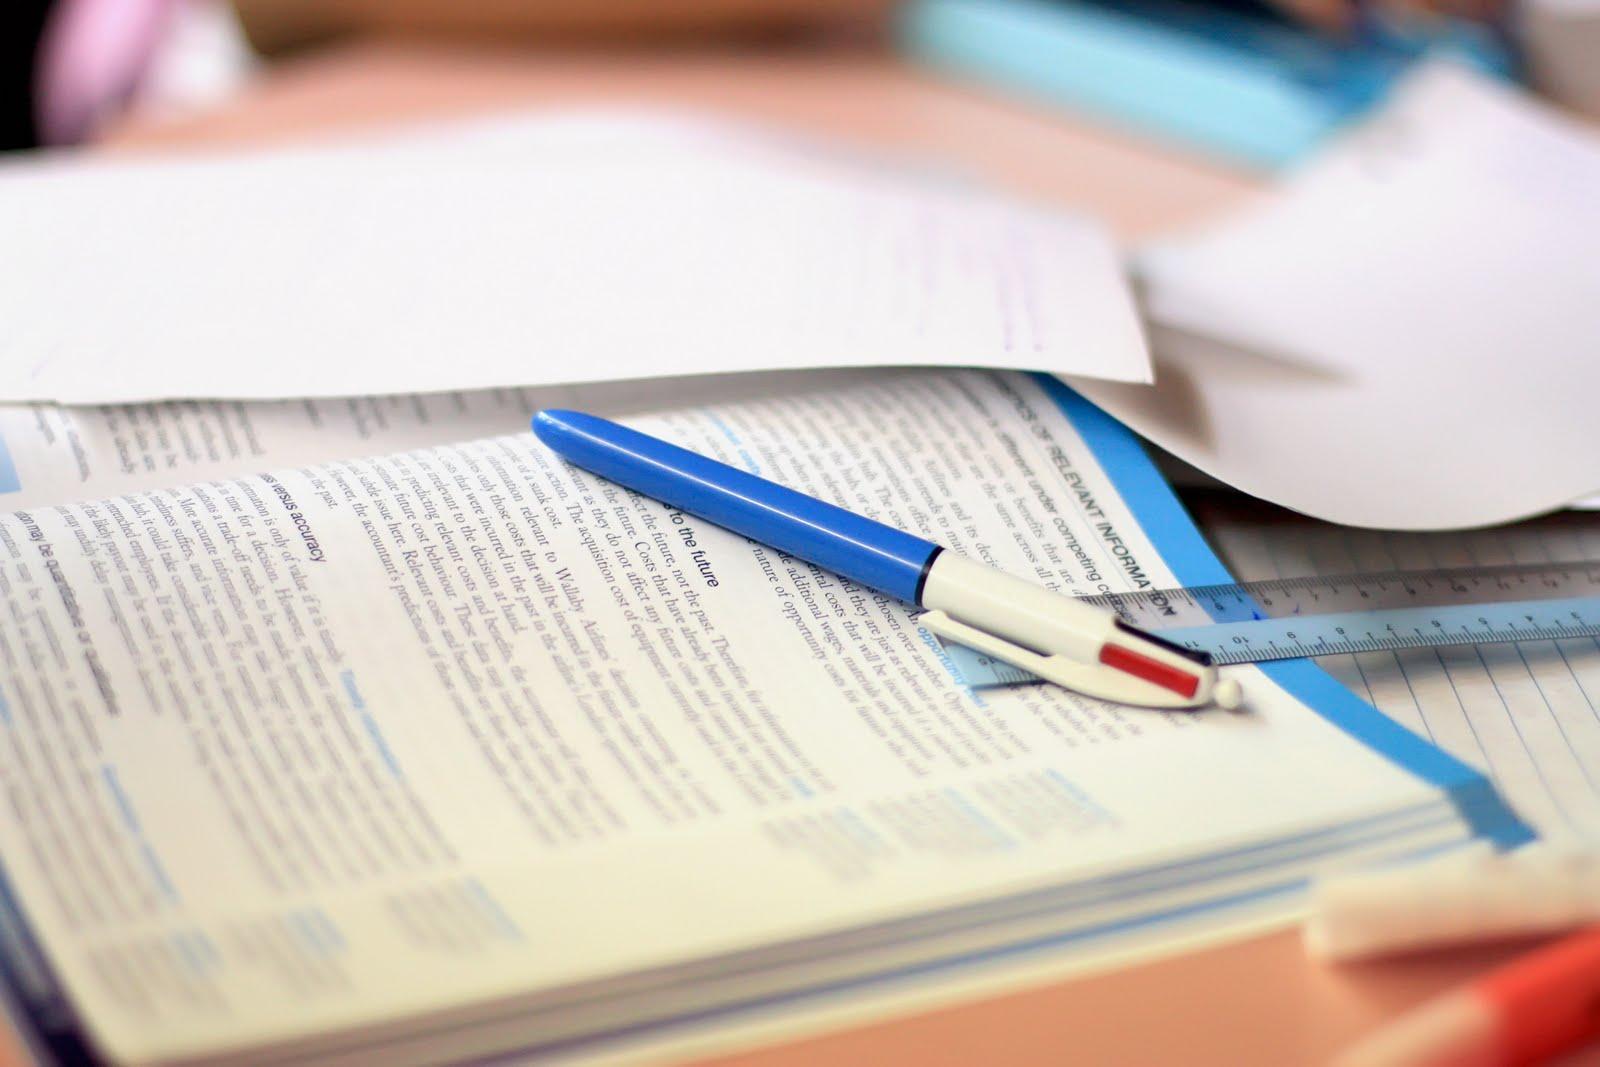 grammar check an essay bahasa melayu